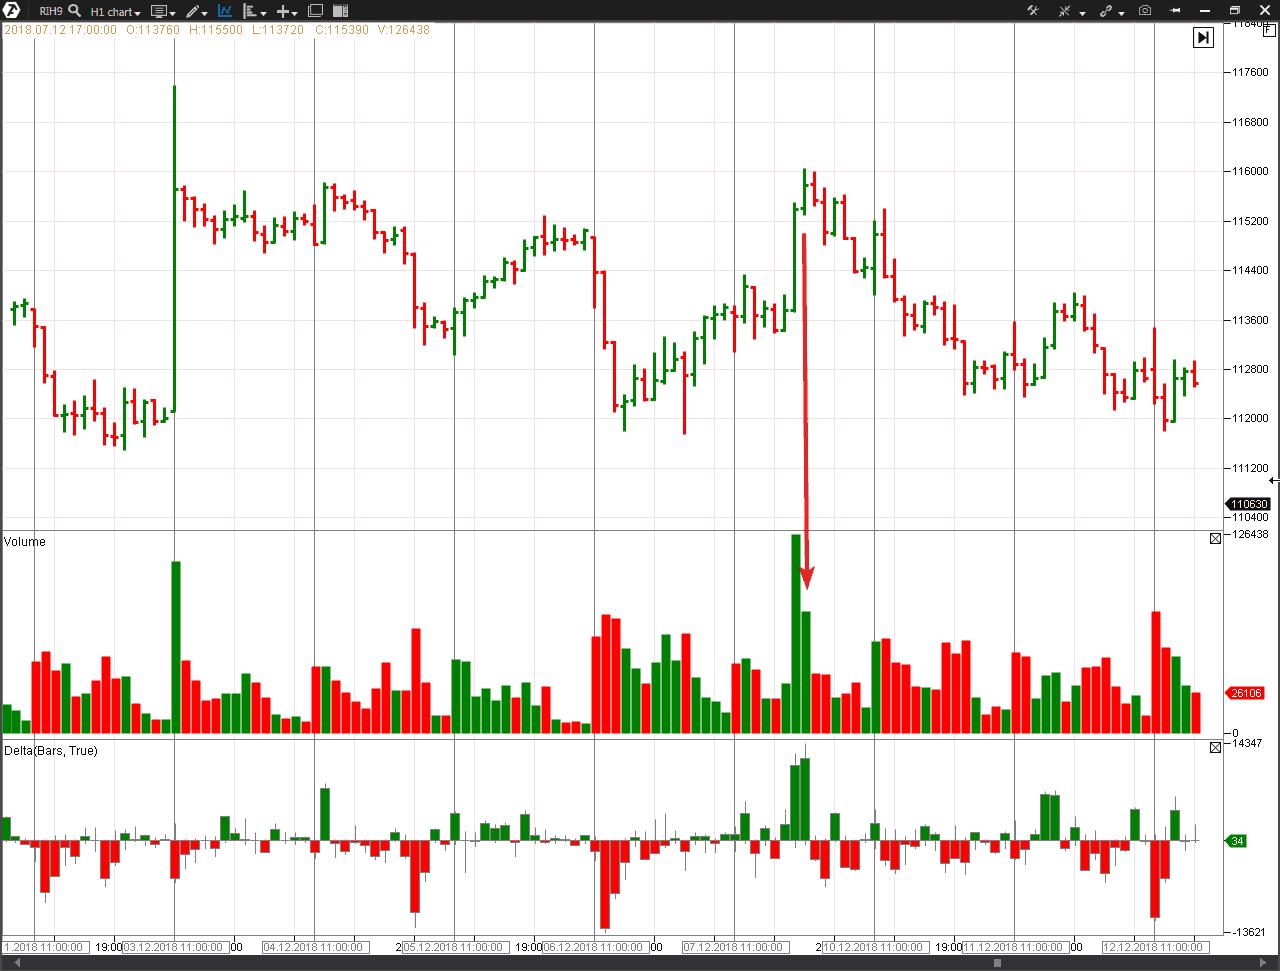 End of Rising Market на рынке фьючерсов РТС